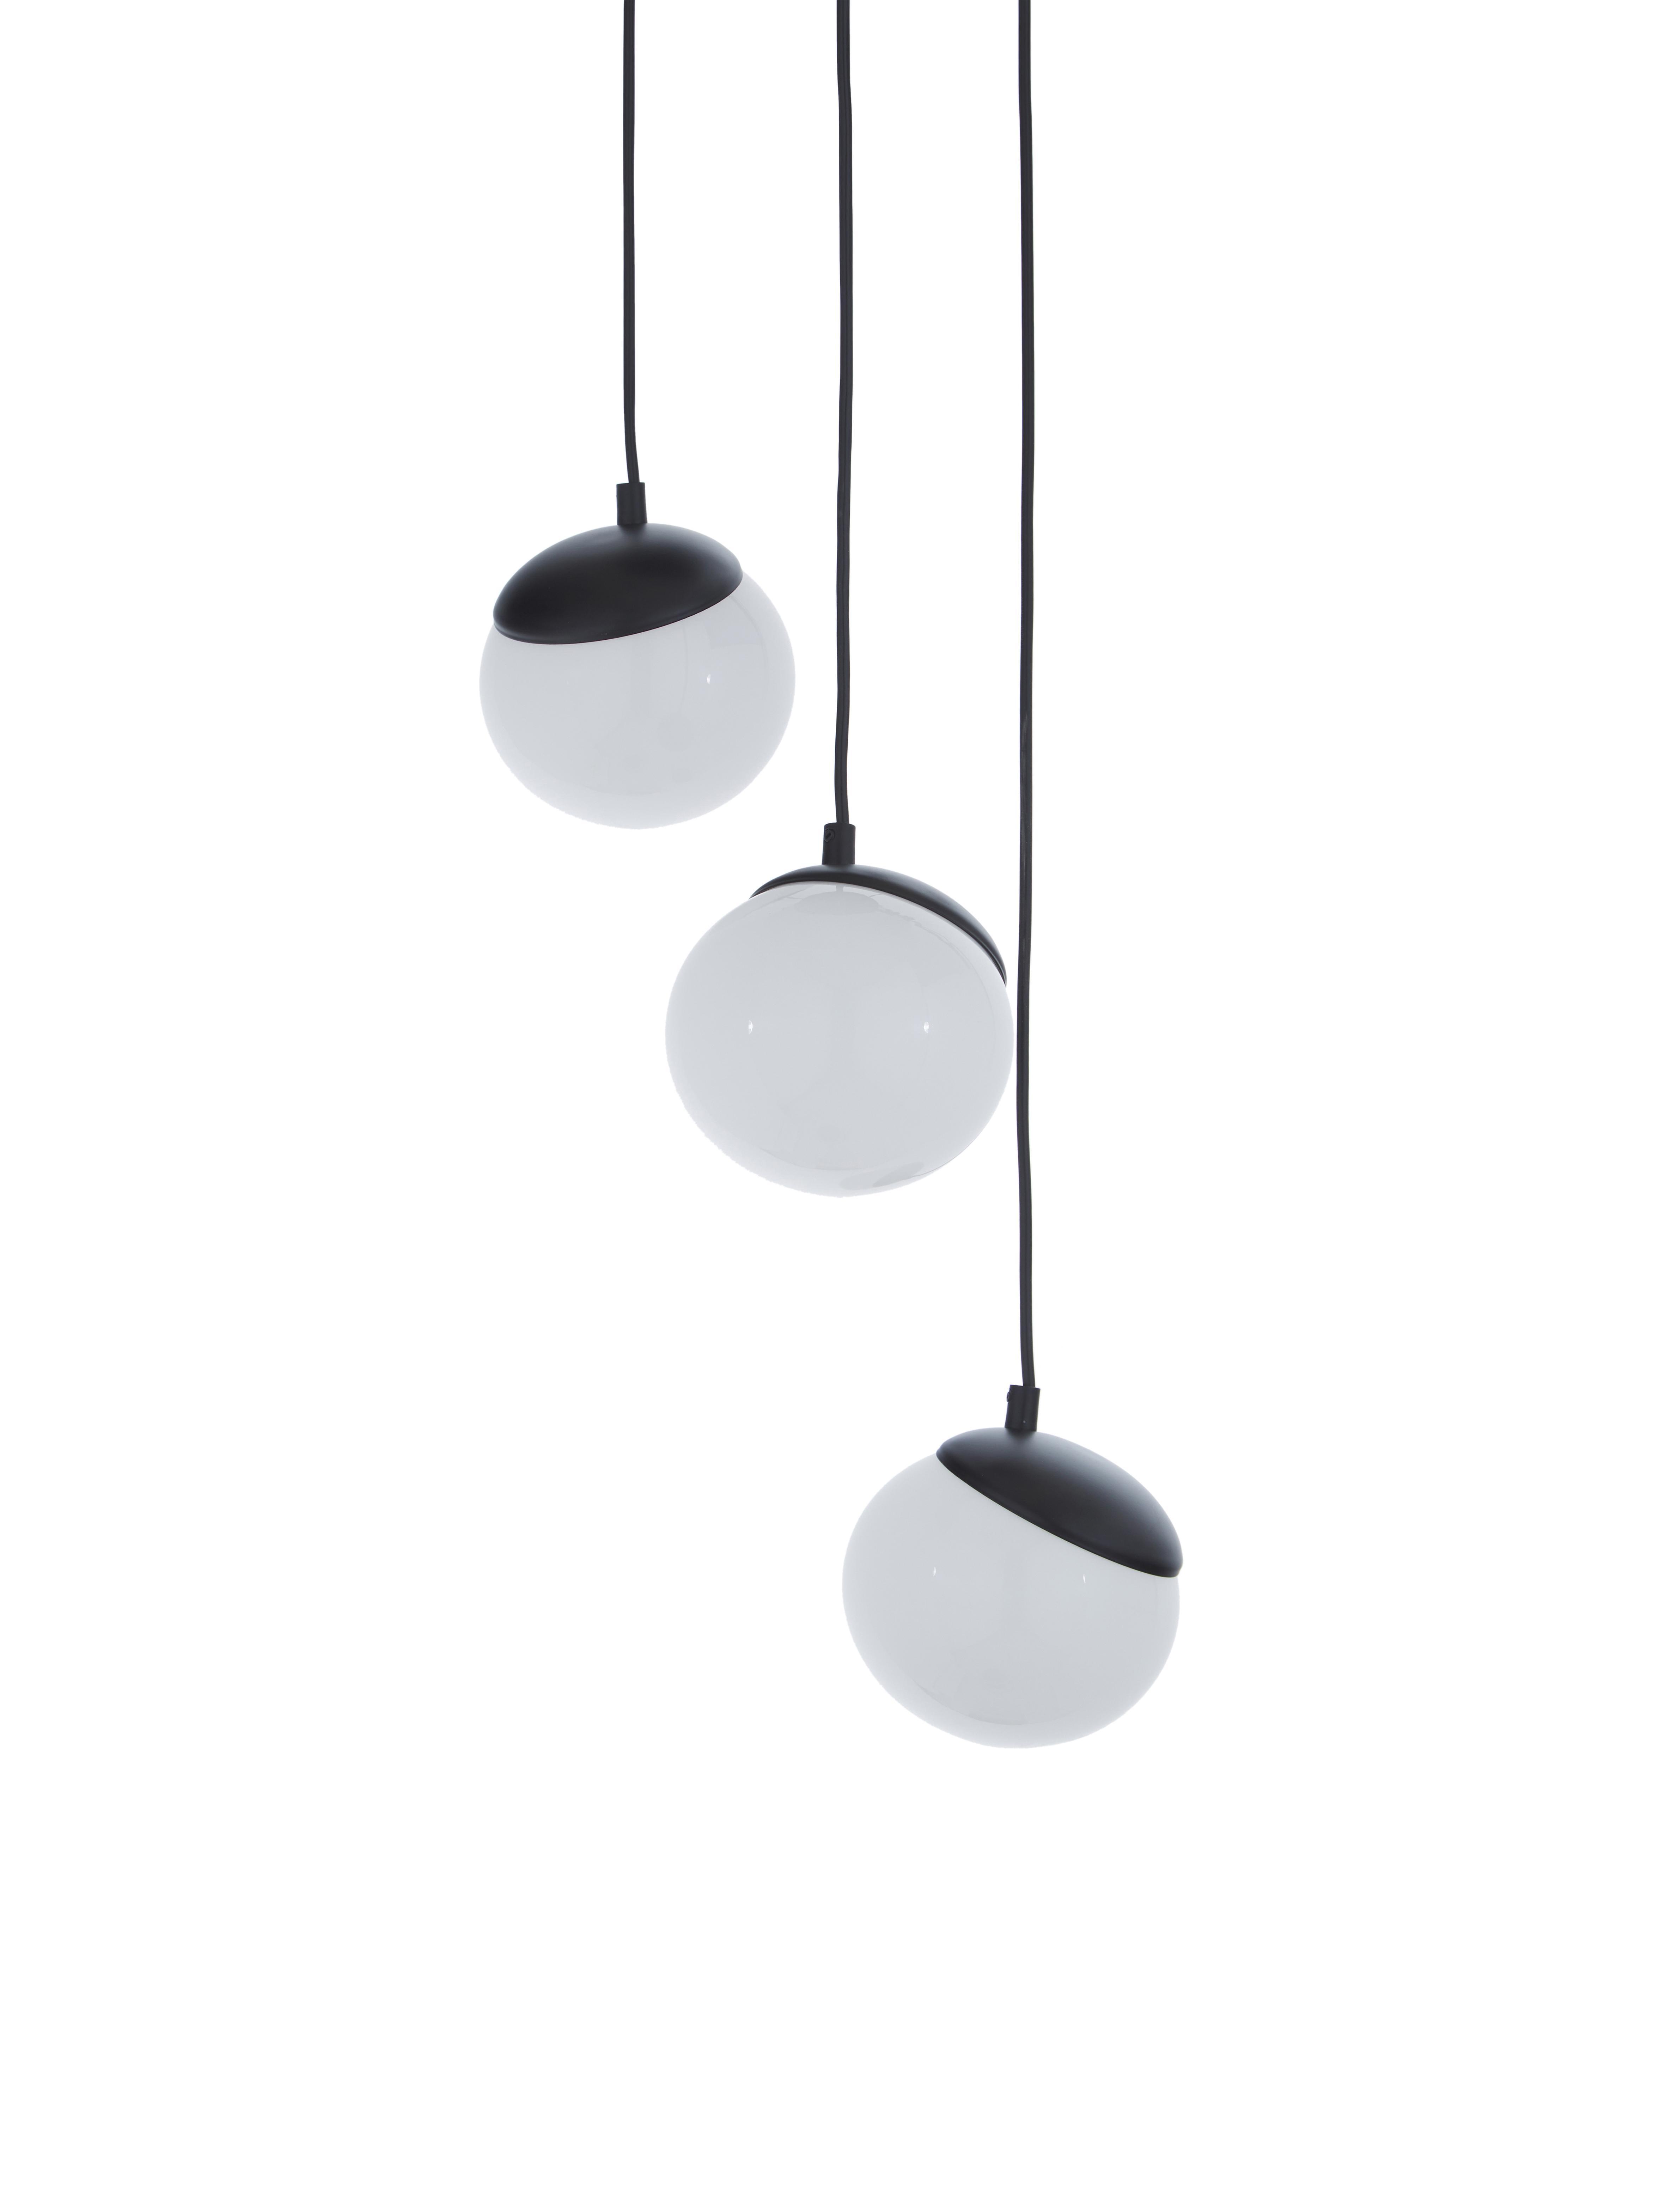 Pendelleuchte Sfera aus Opalglas, Lampenschirm: Opalglas, Schwarz, Opalweiss, Ø 35 x H 90 cm